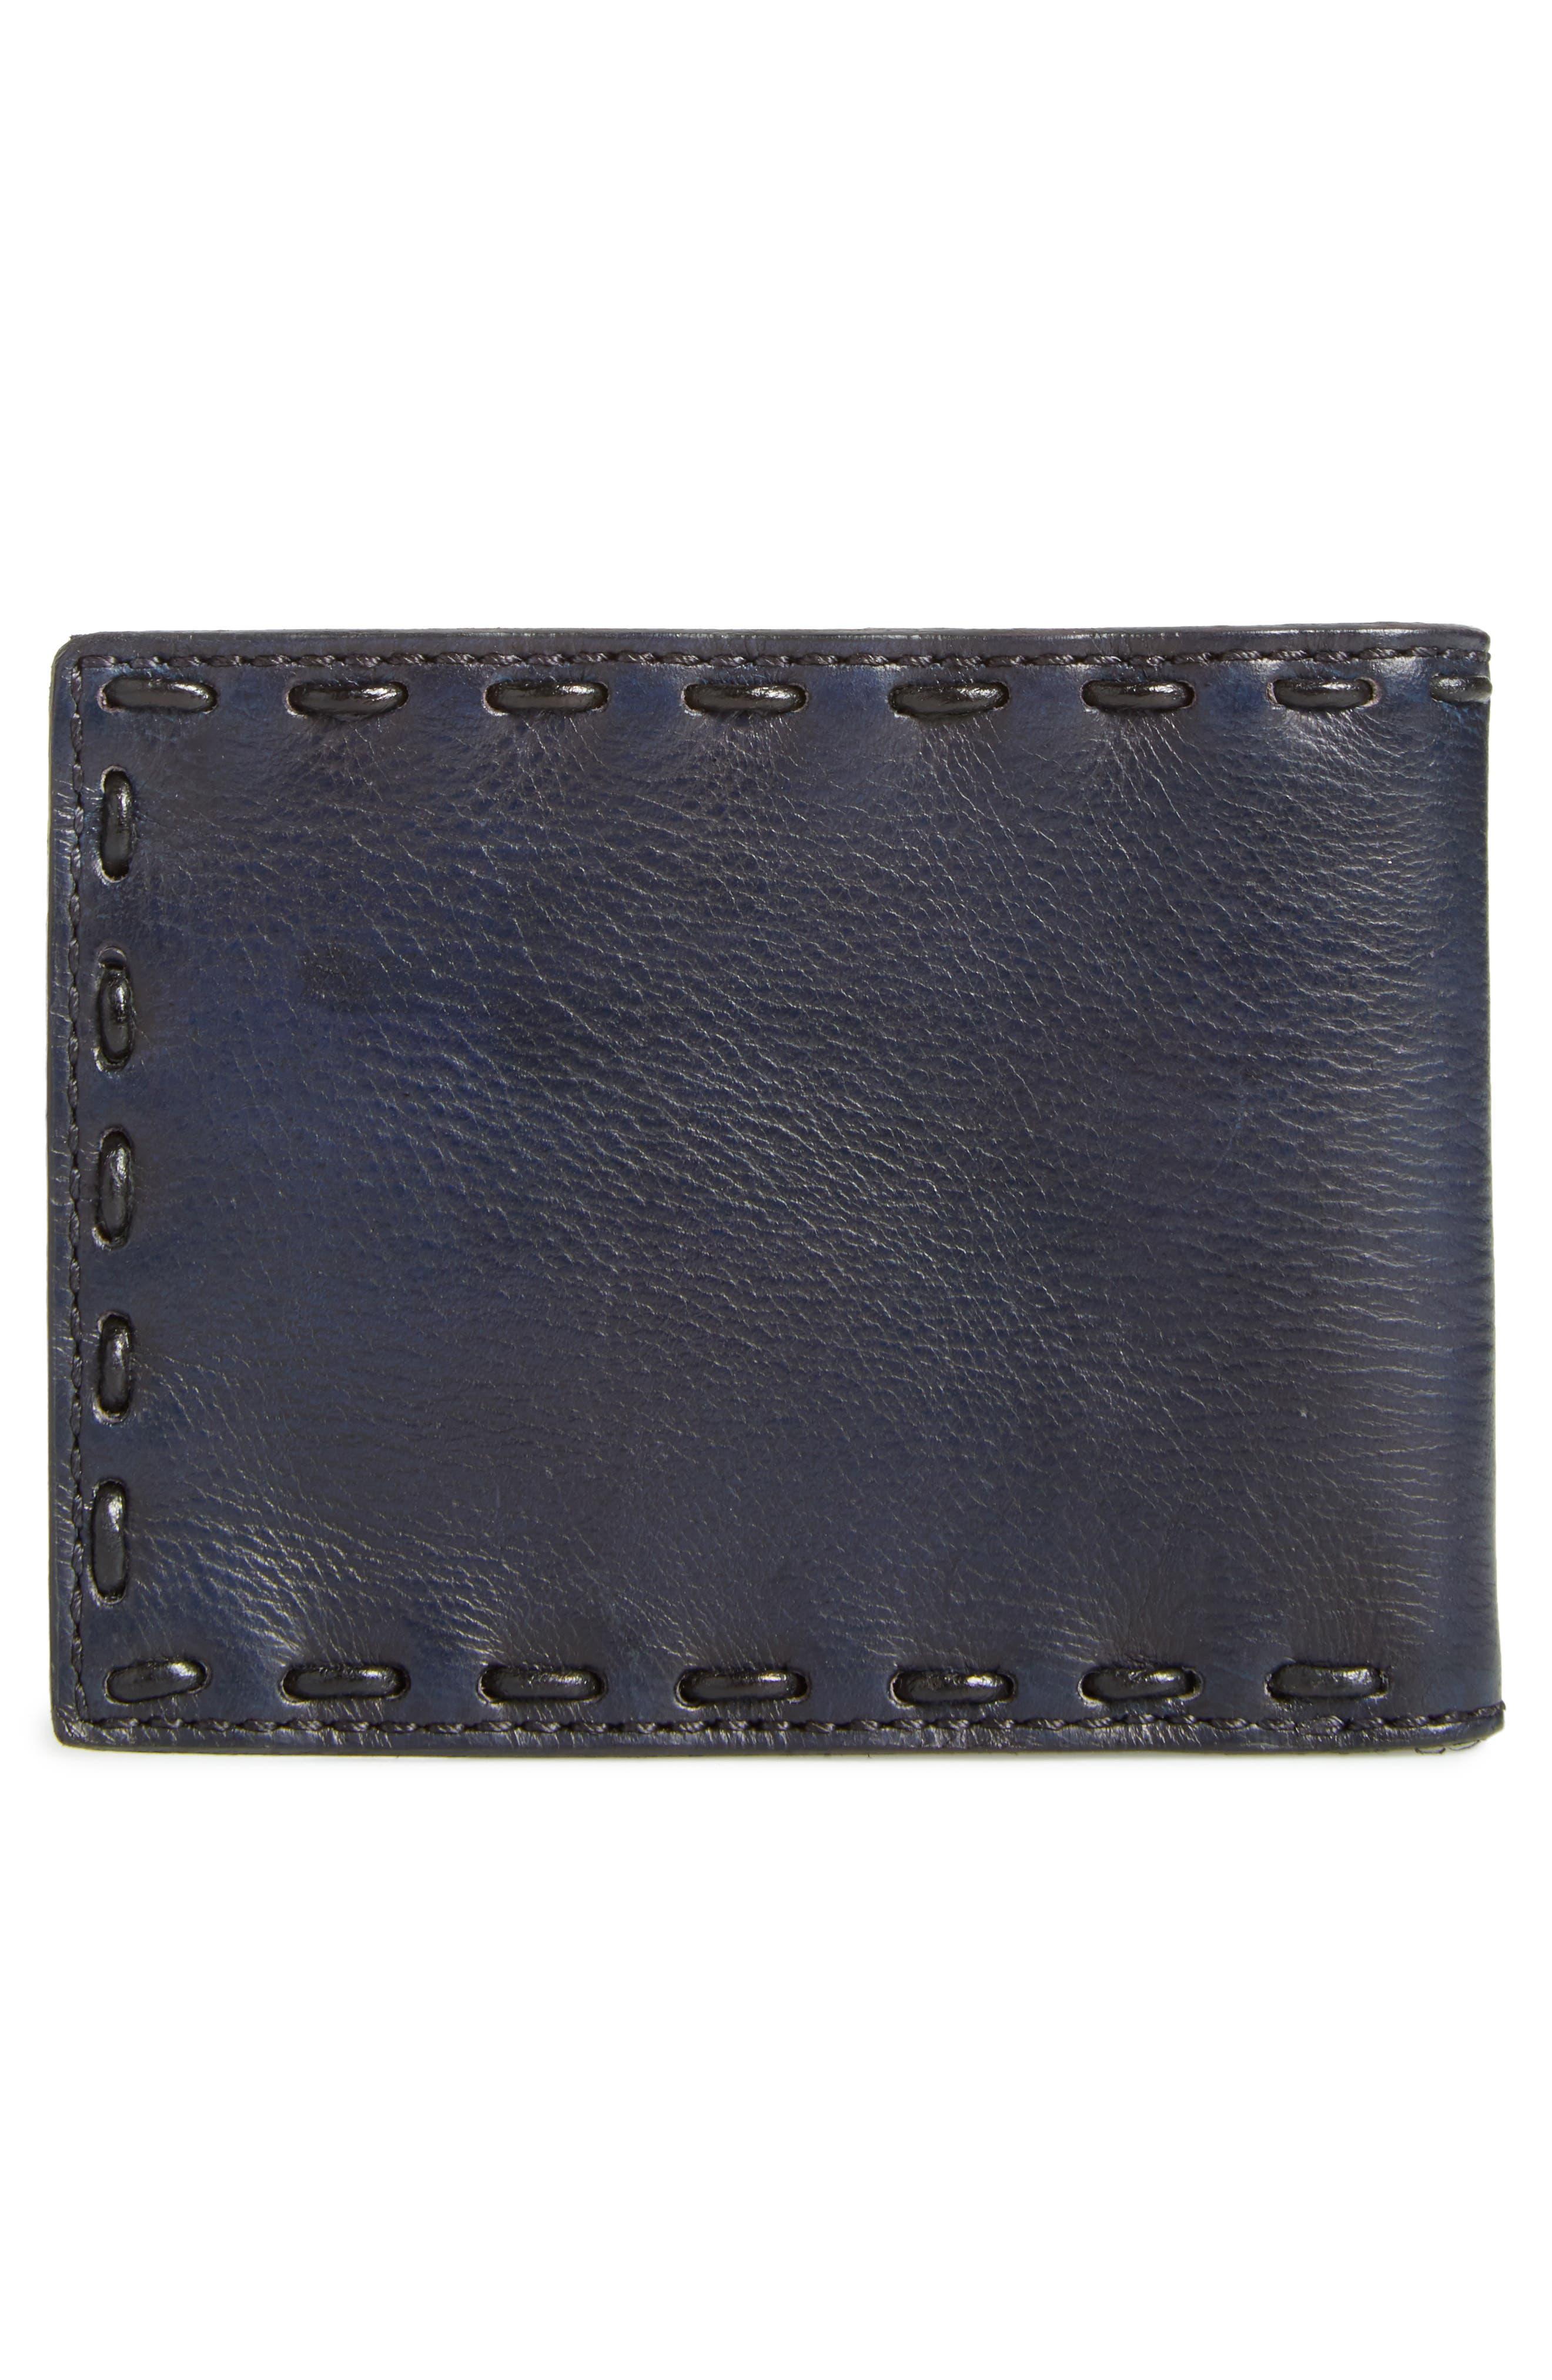 Pickstitch Leather Bifold Wallet,                             Alternate thumbnail 3, color,                             094